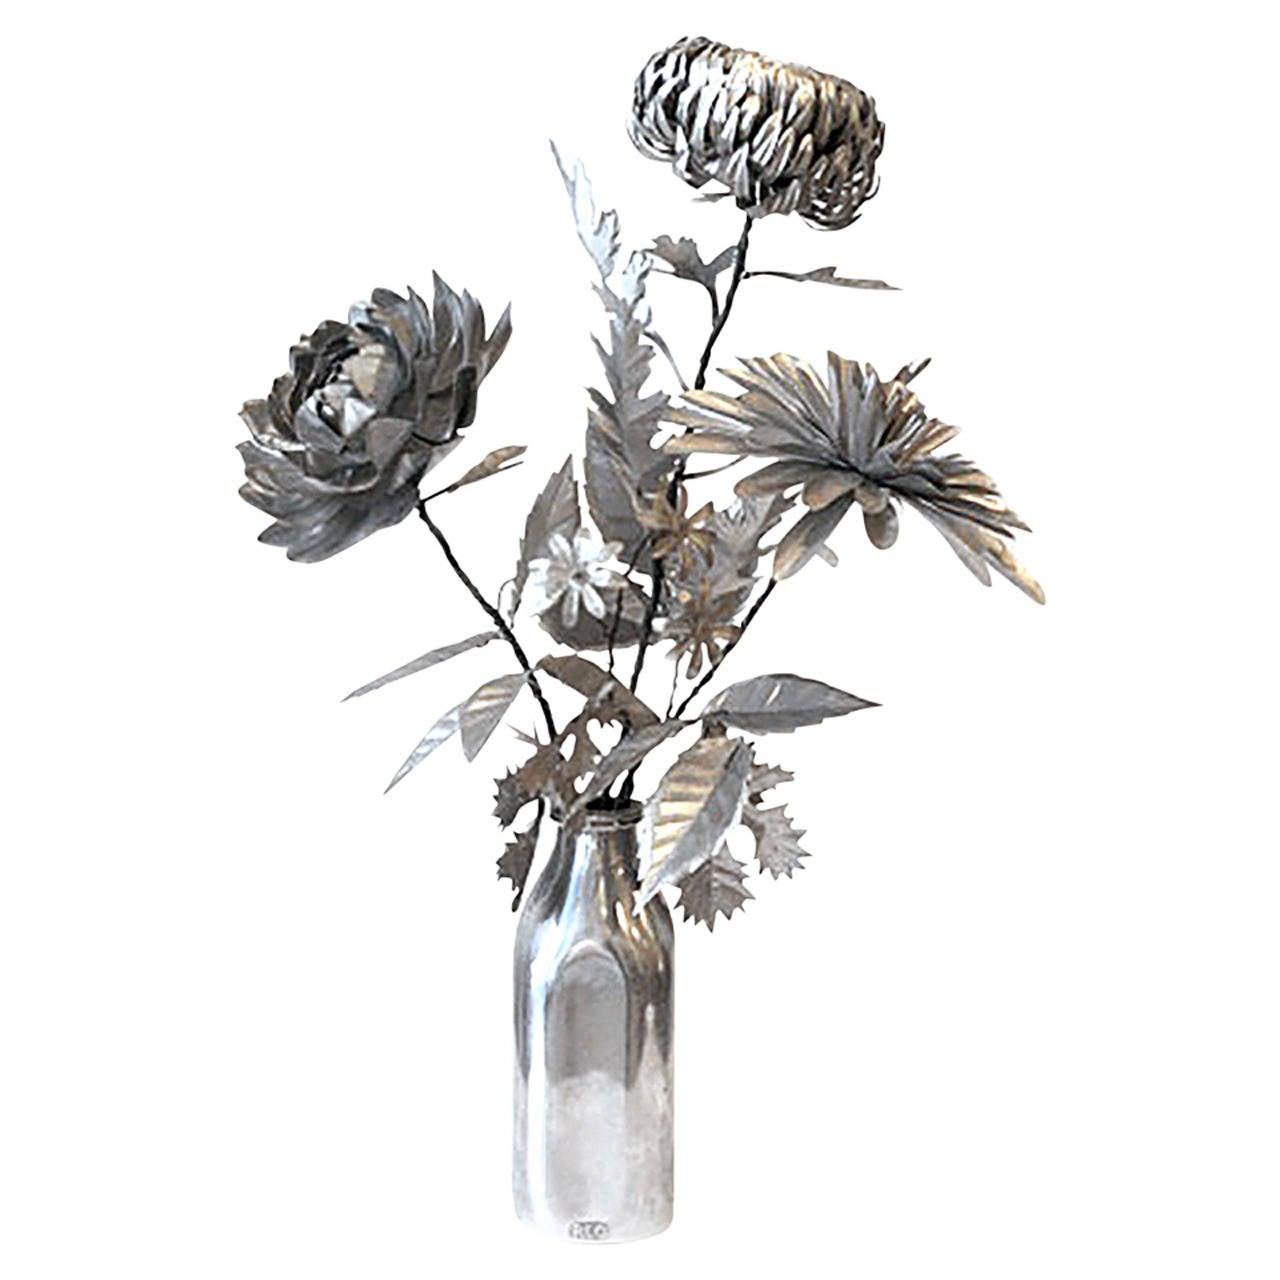 Kirk Maxson Cut Metal Flower Sculpture For Sale At 1stdibs